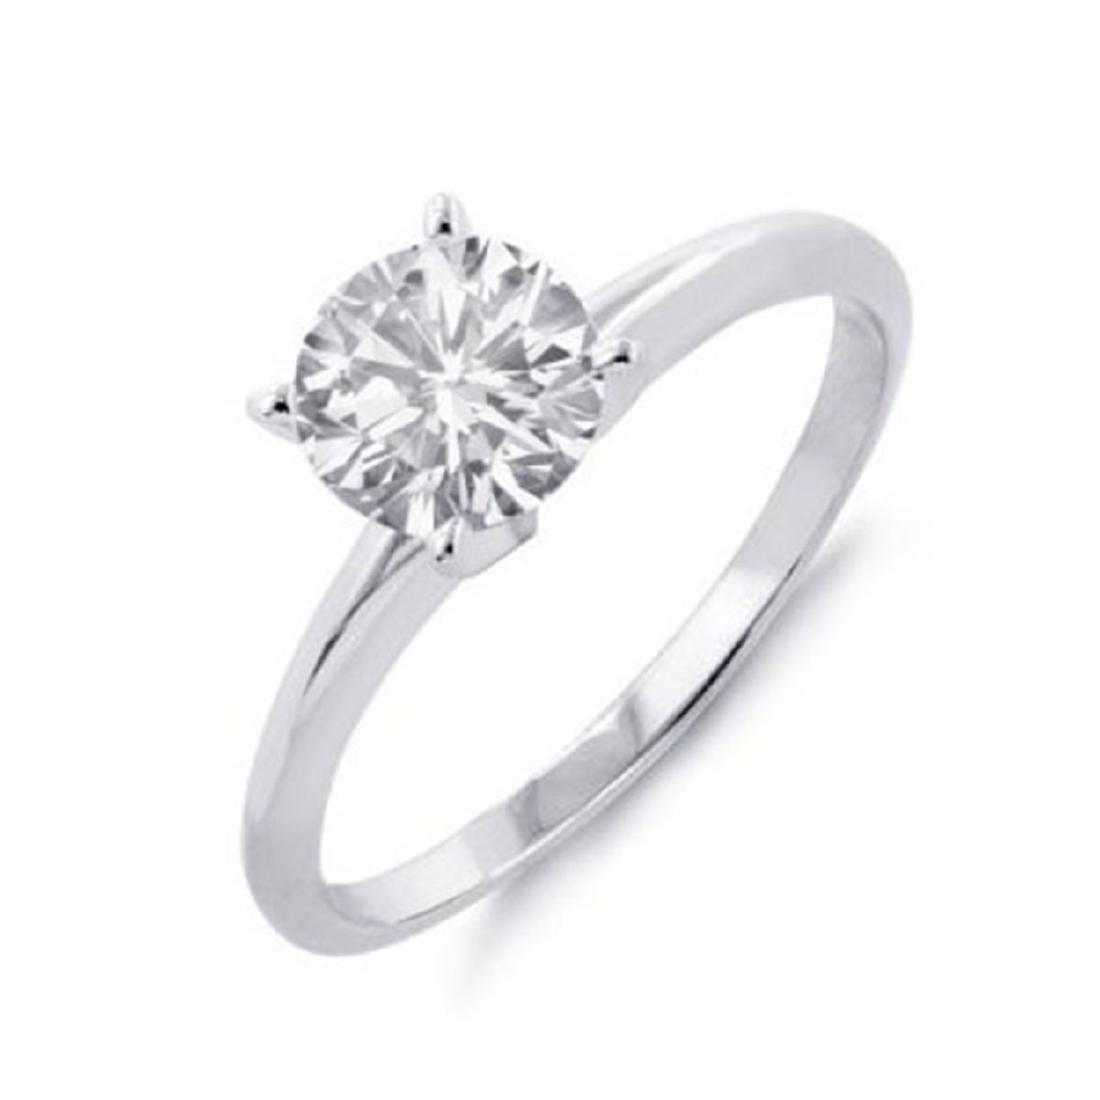 1.0 ctw VS/SI Diamond Solitaire Ring 18K White Gold -